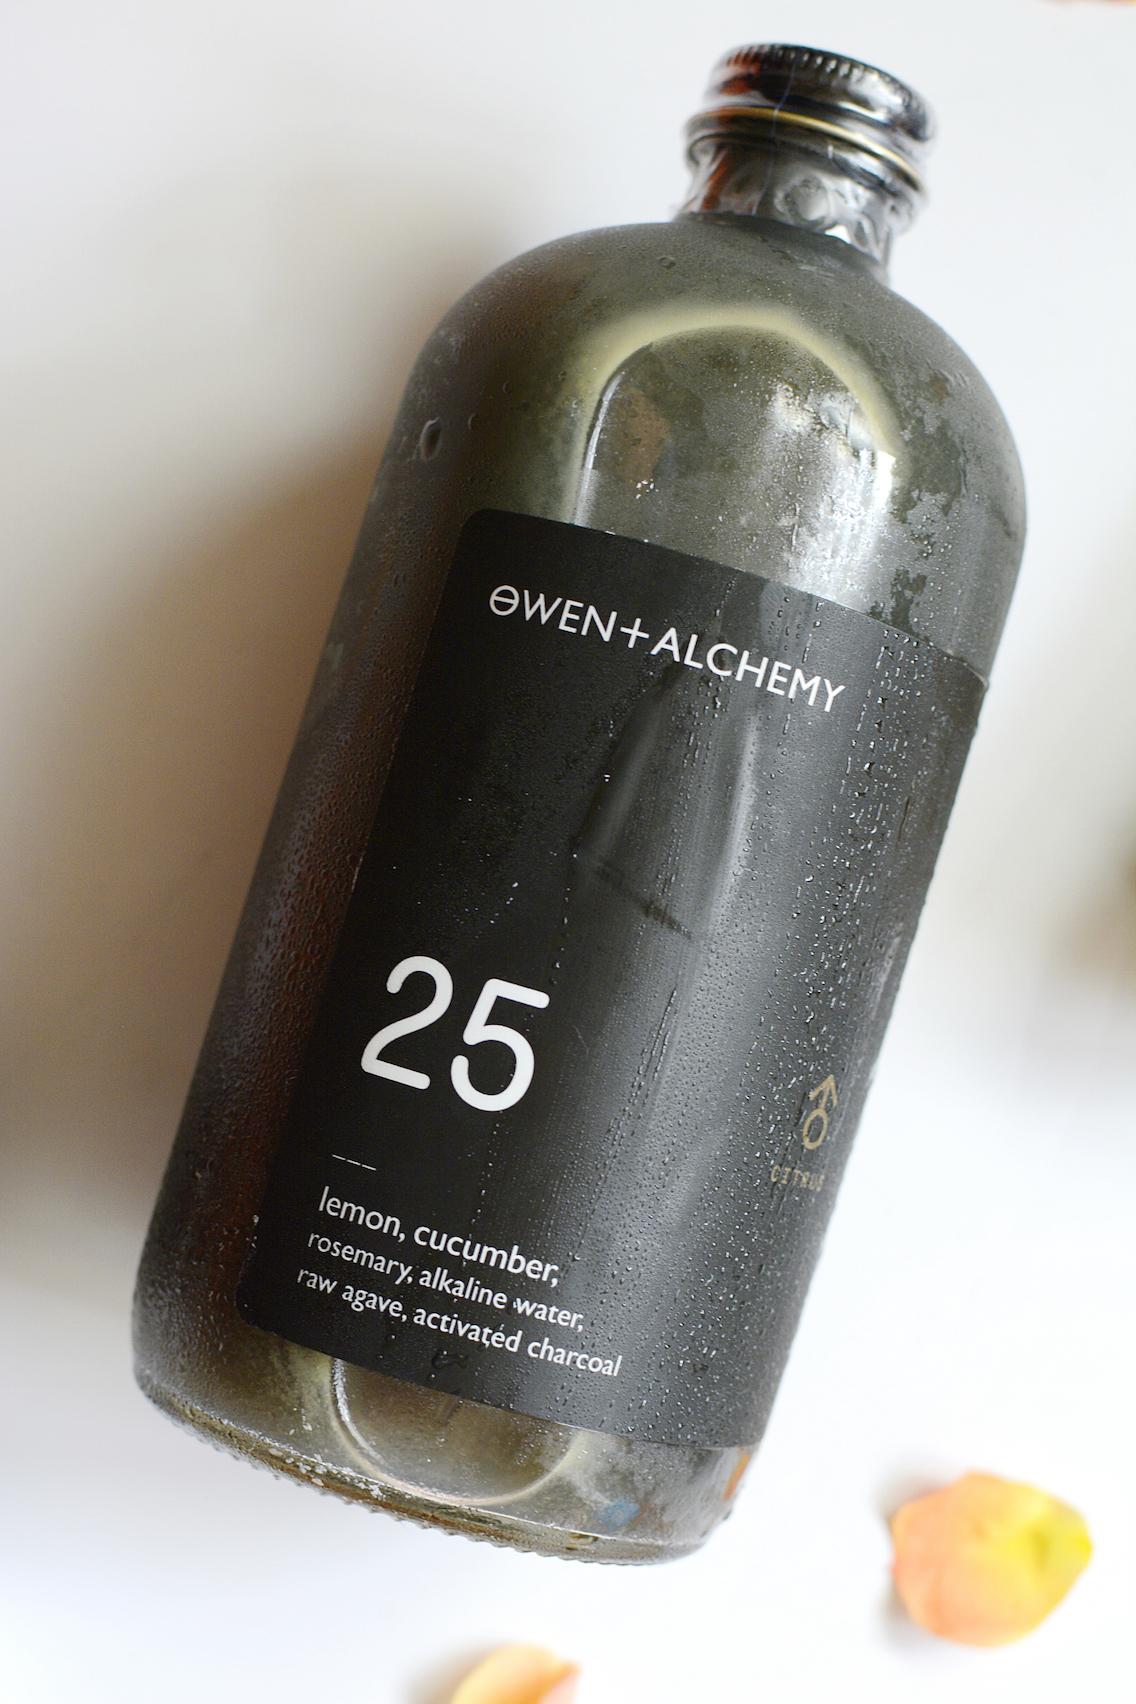 Victoria Beckham Smythson Owen + Alchemy 9